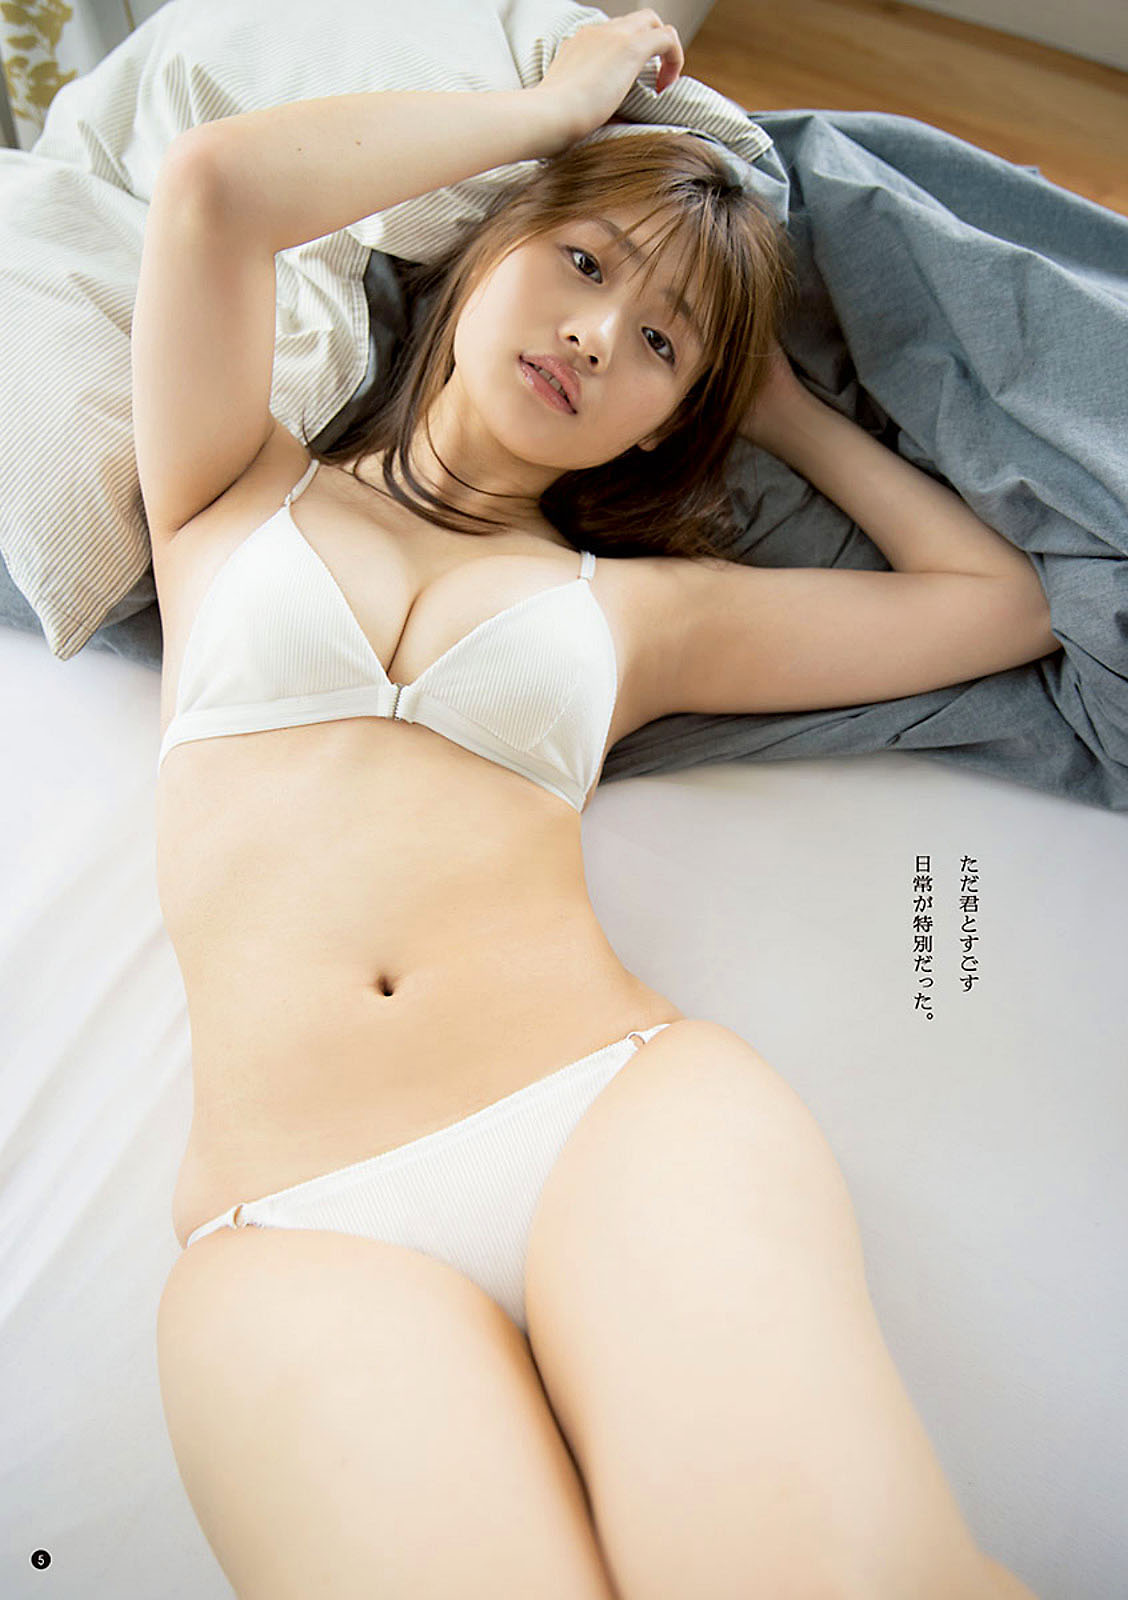 Momoka Ishida Young Champion 210713 04.jpg